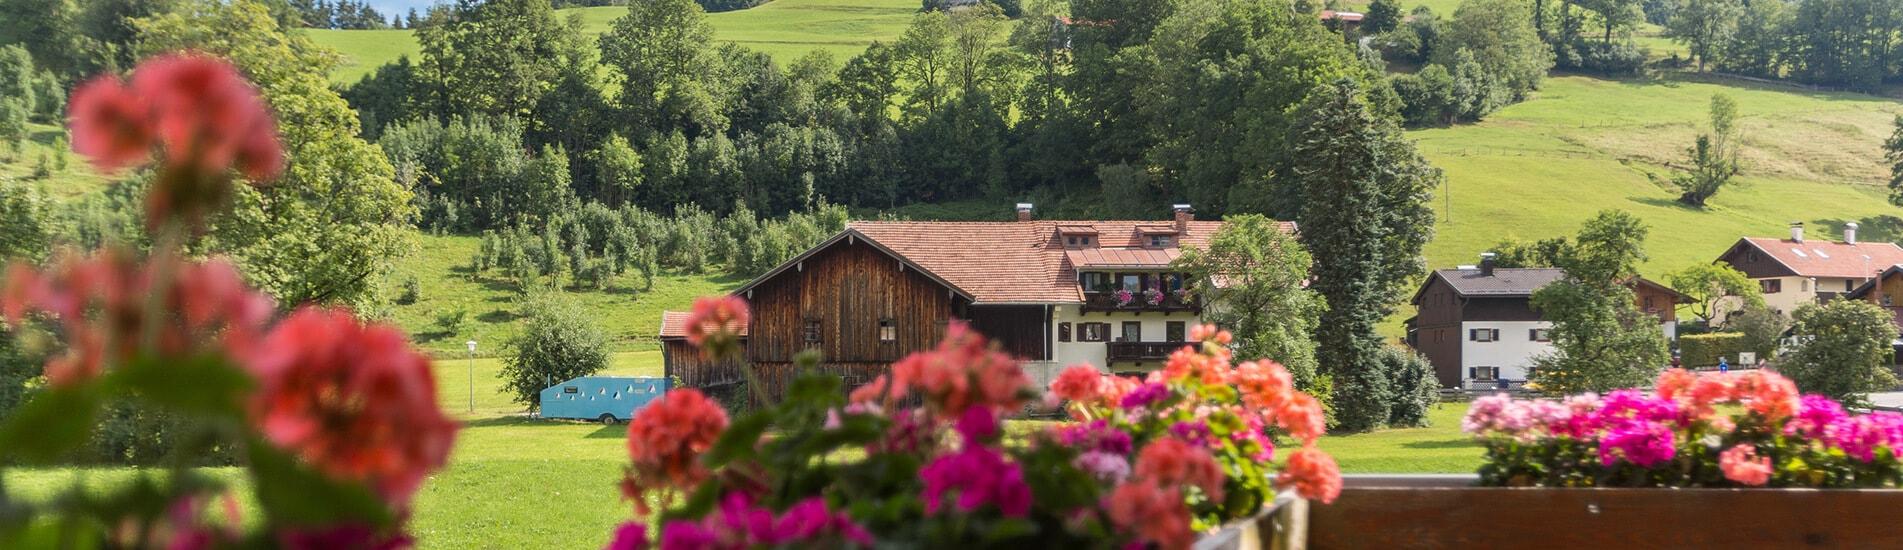 Best Resort in Bavaria